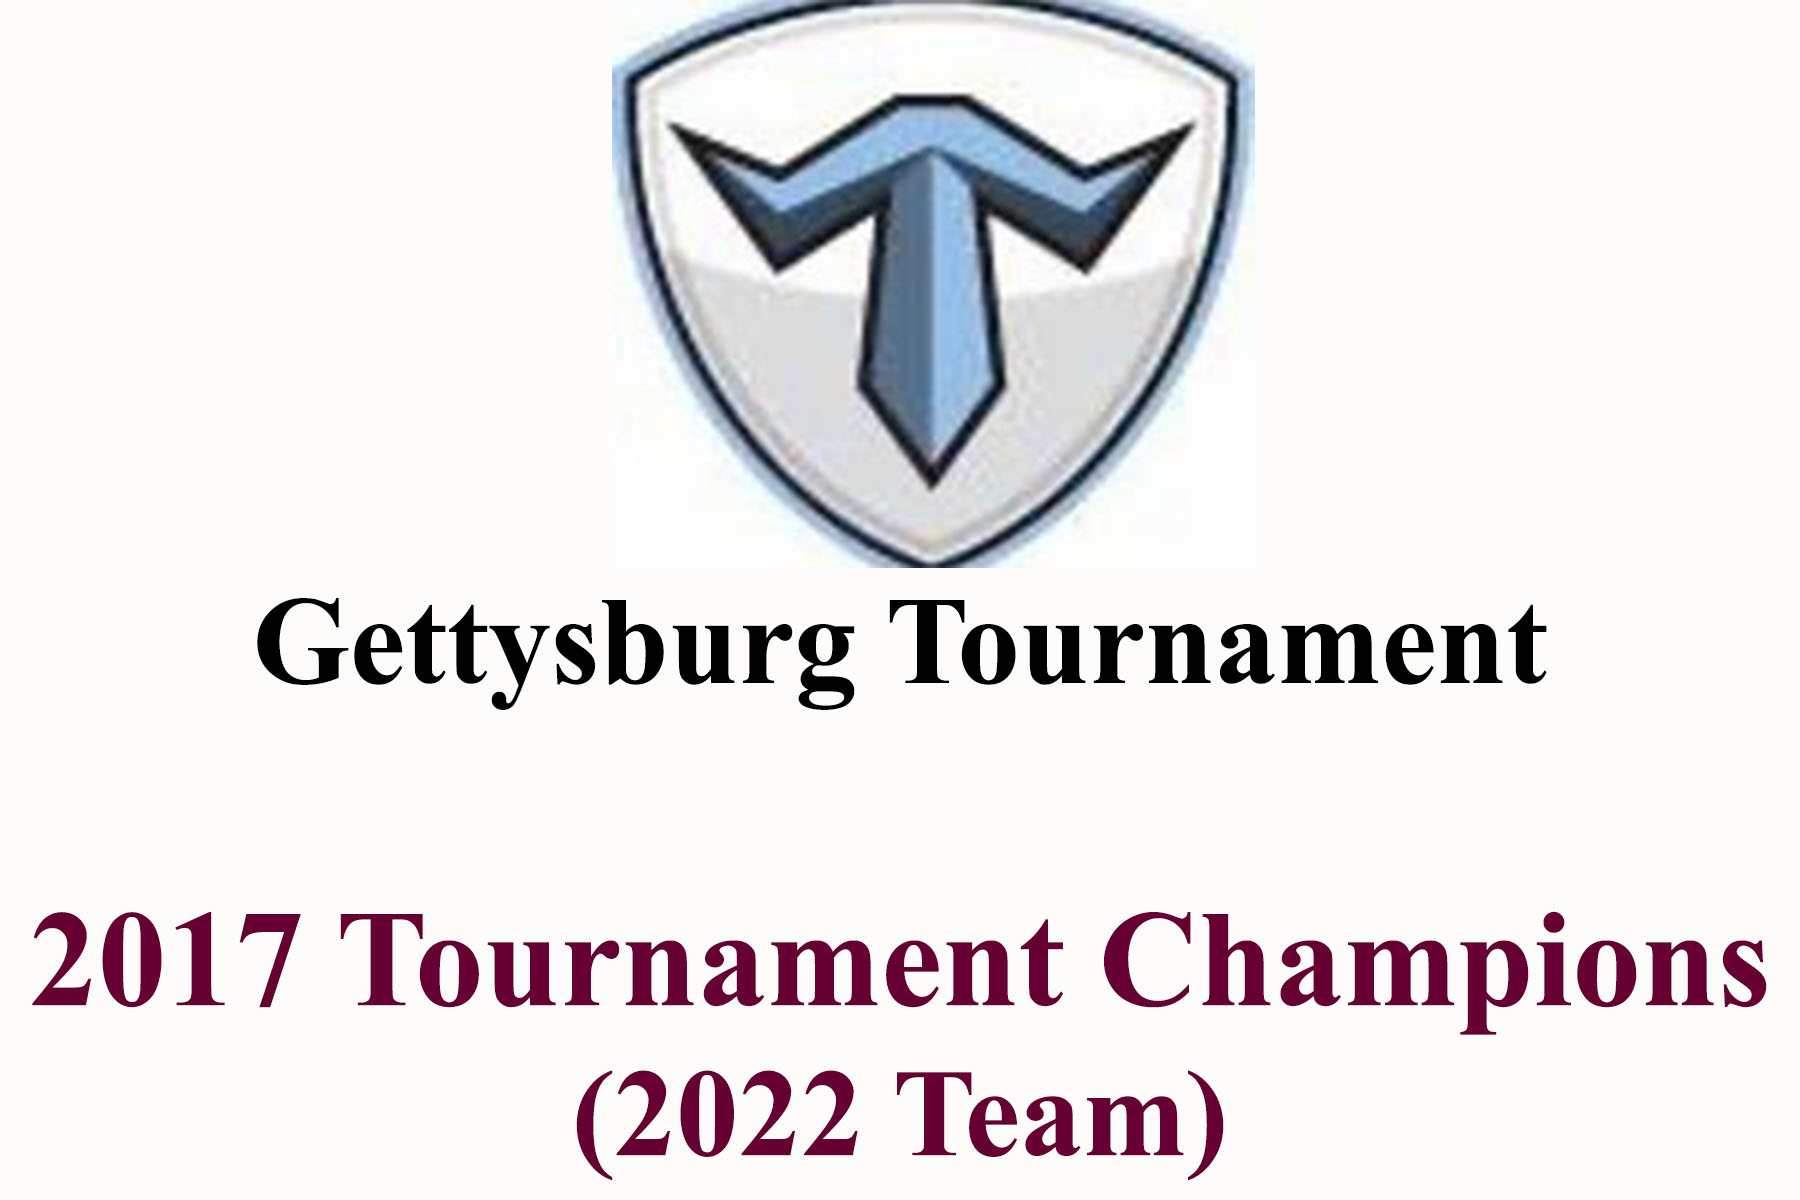 gettysburg 2022